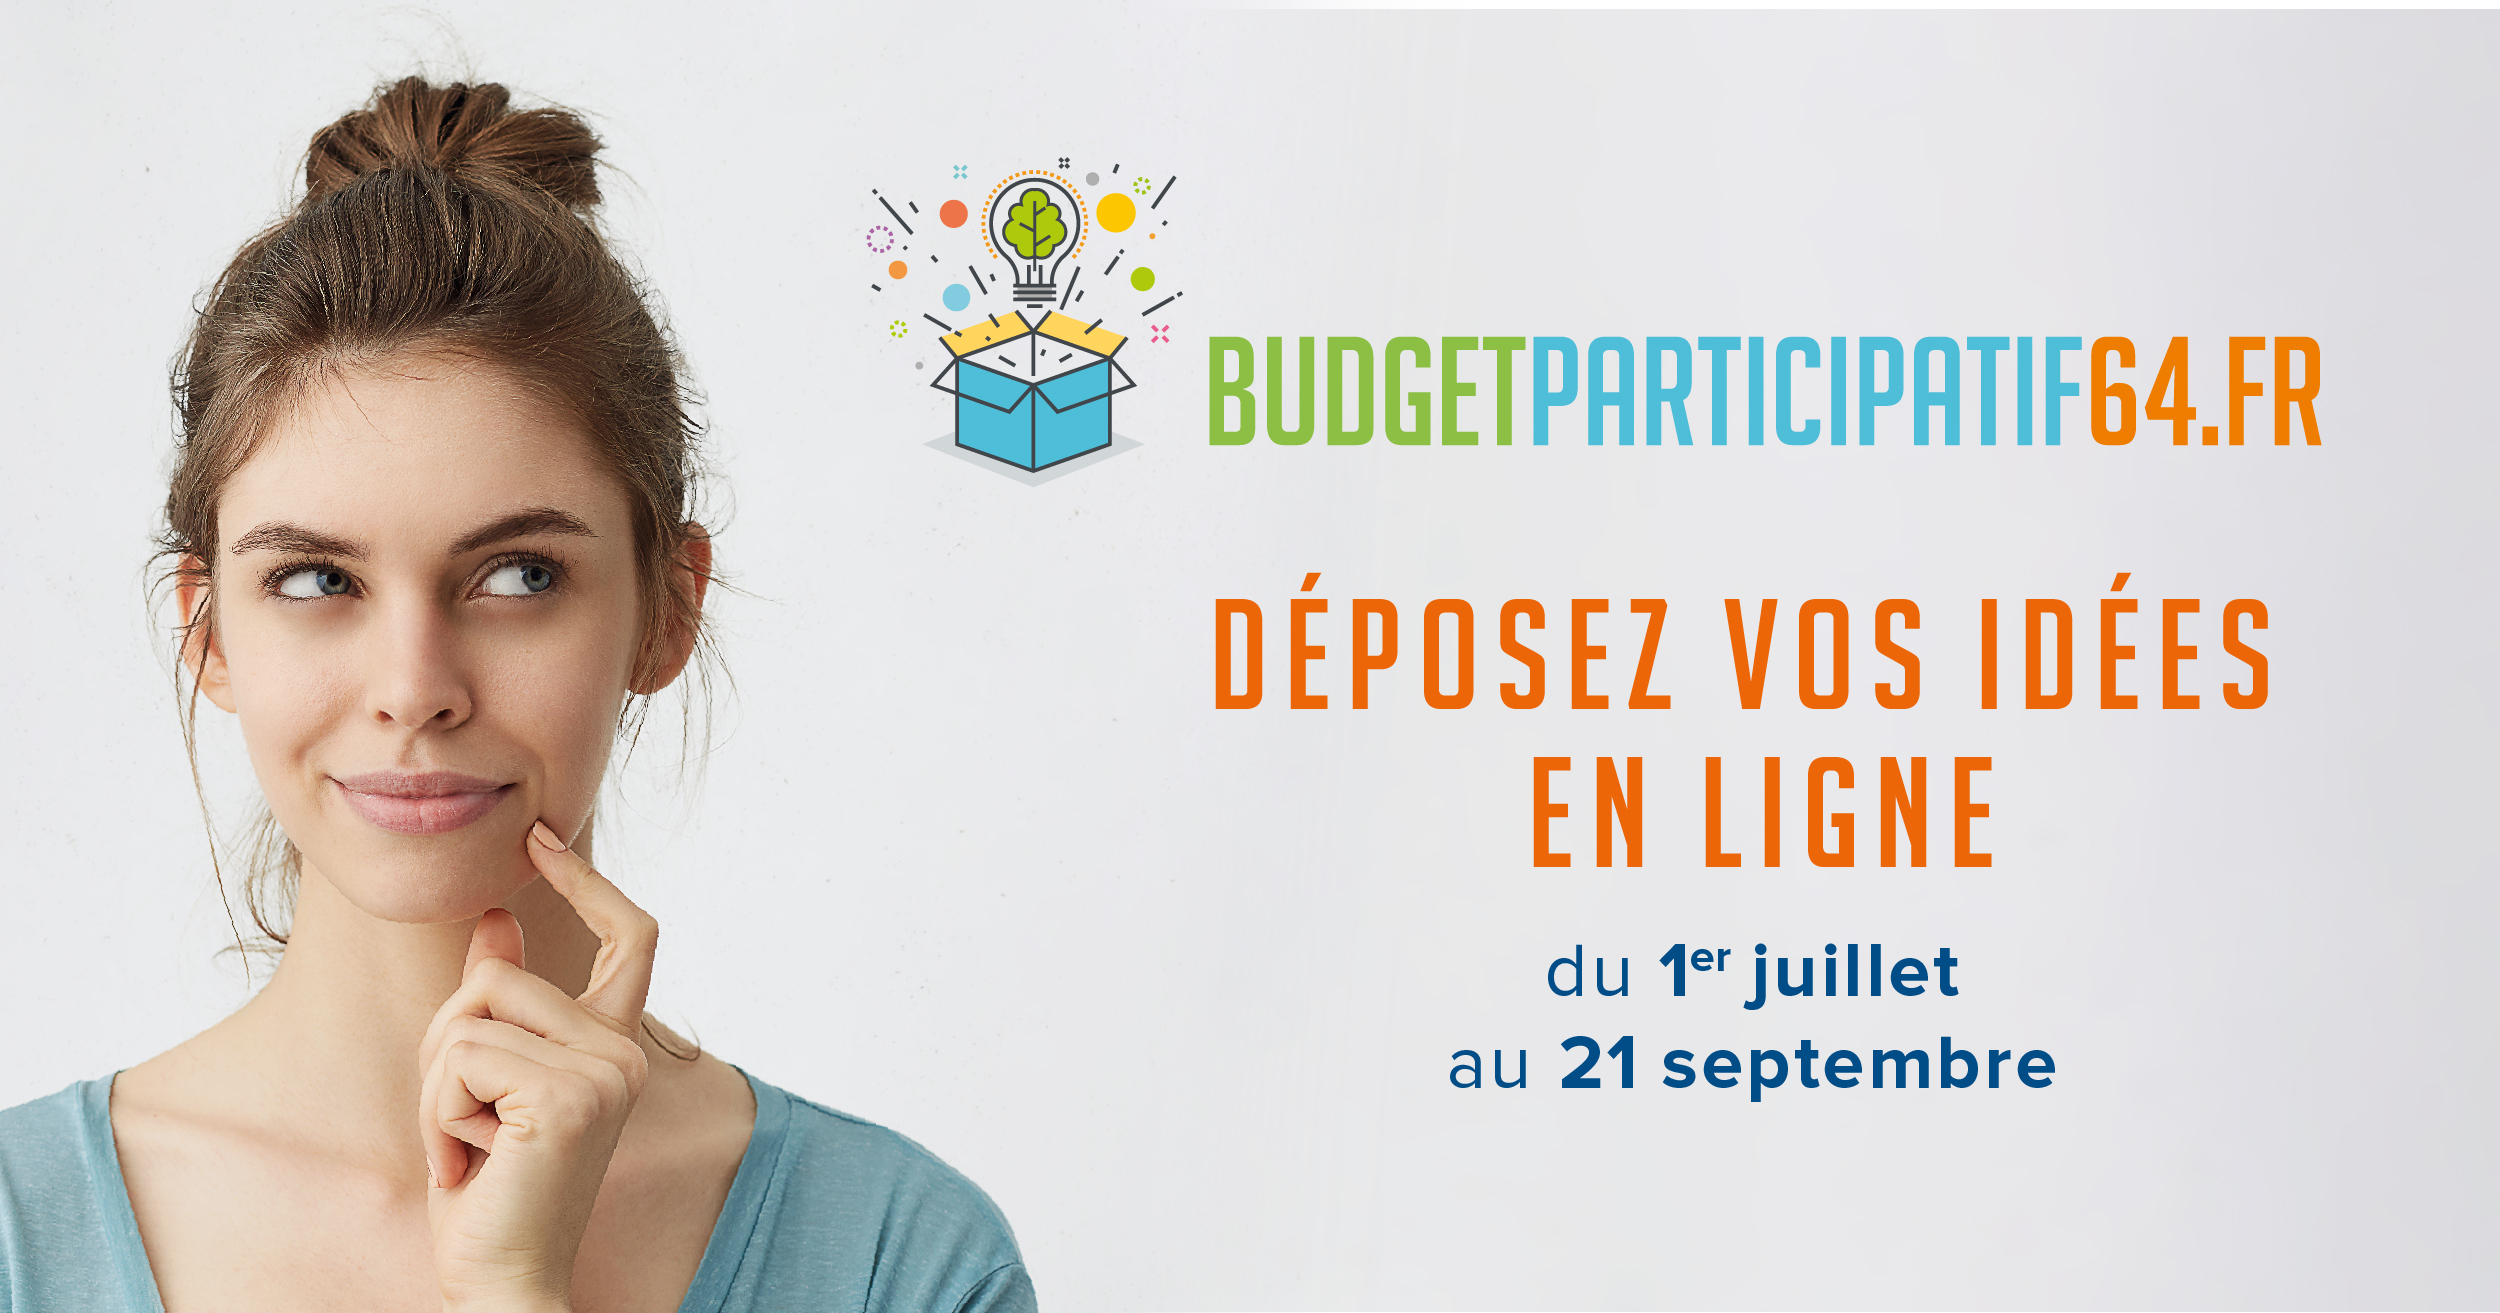 visuel_budgetparticipatif64